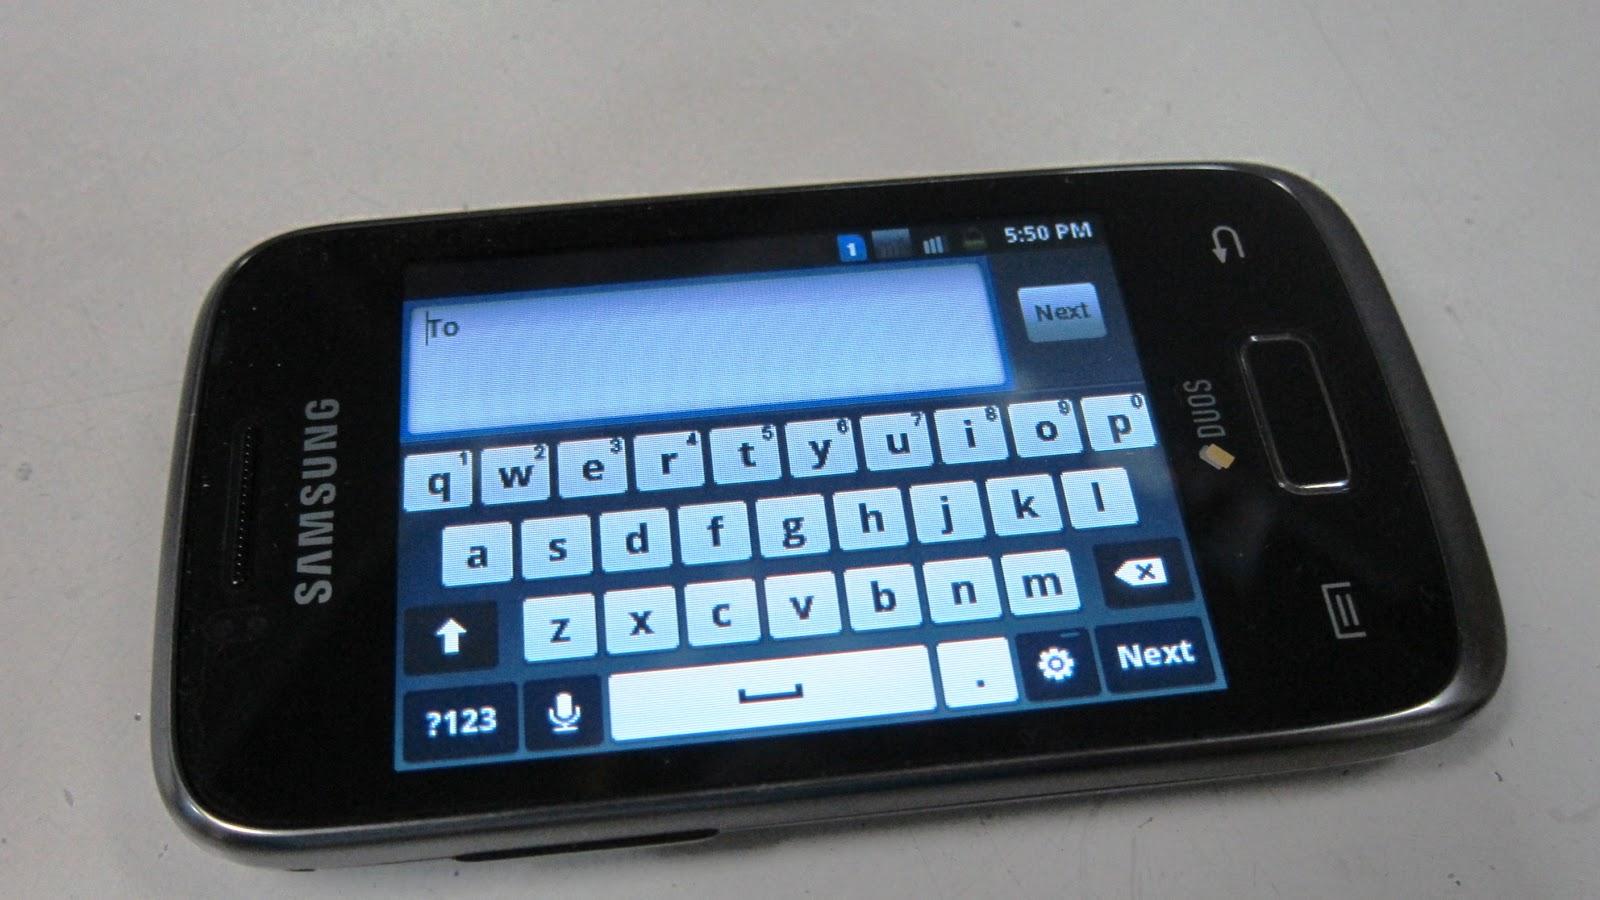 samsung galaxy y duos gt-s6102 инструкция по смс